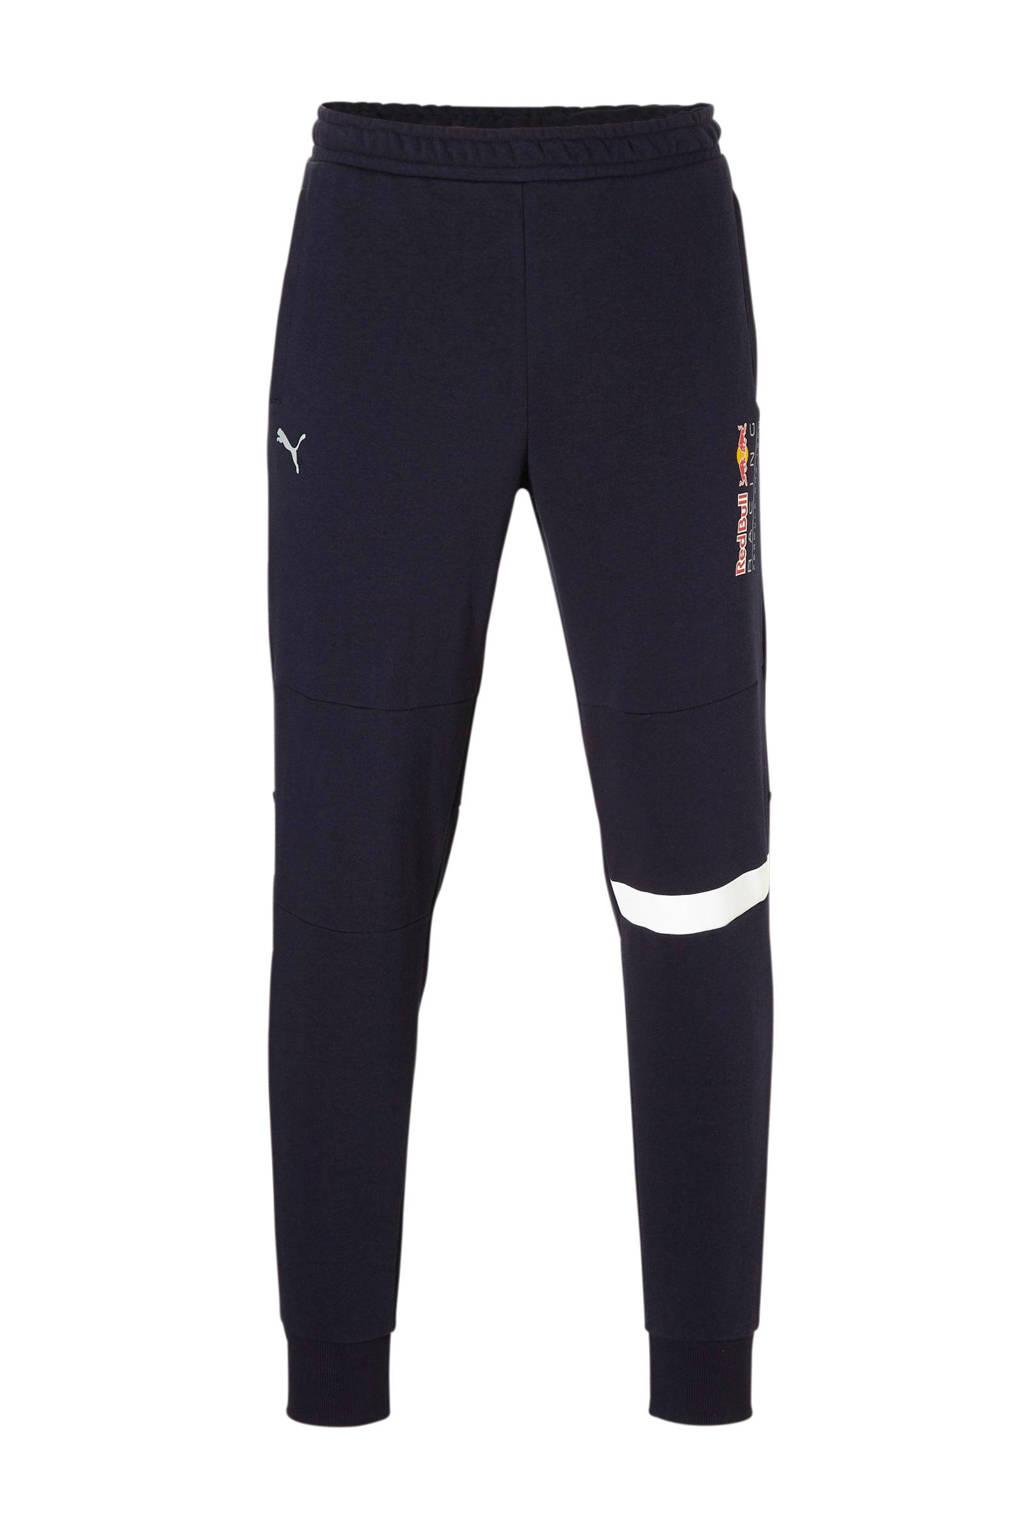 Puma Red Bull Racing joggingbroek donkerblauw, Donkerblauw